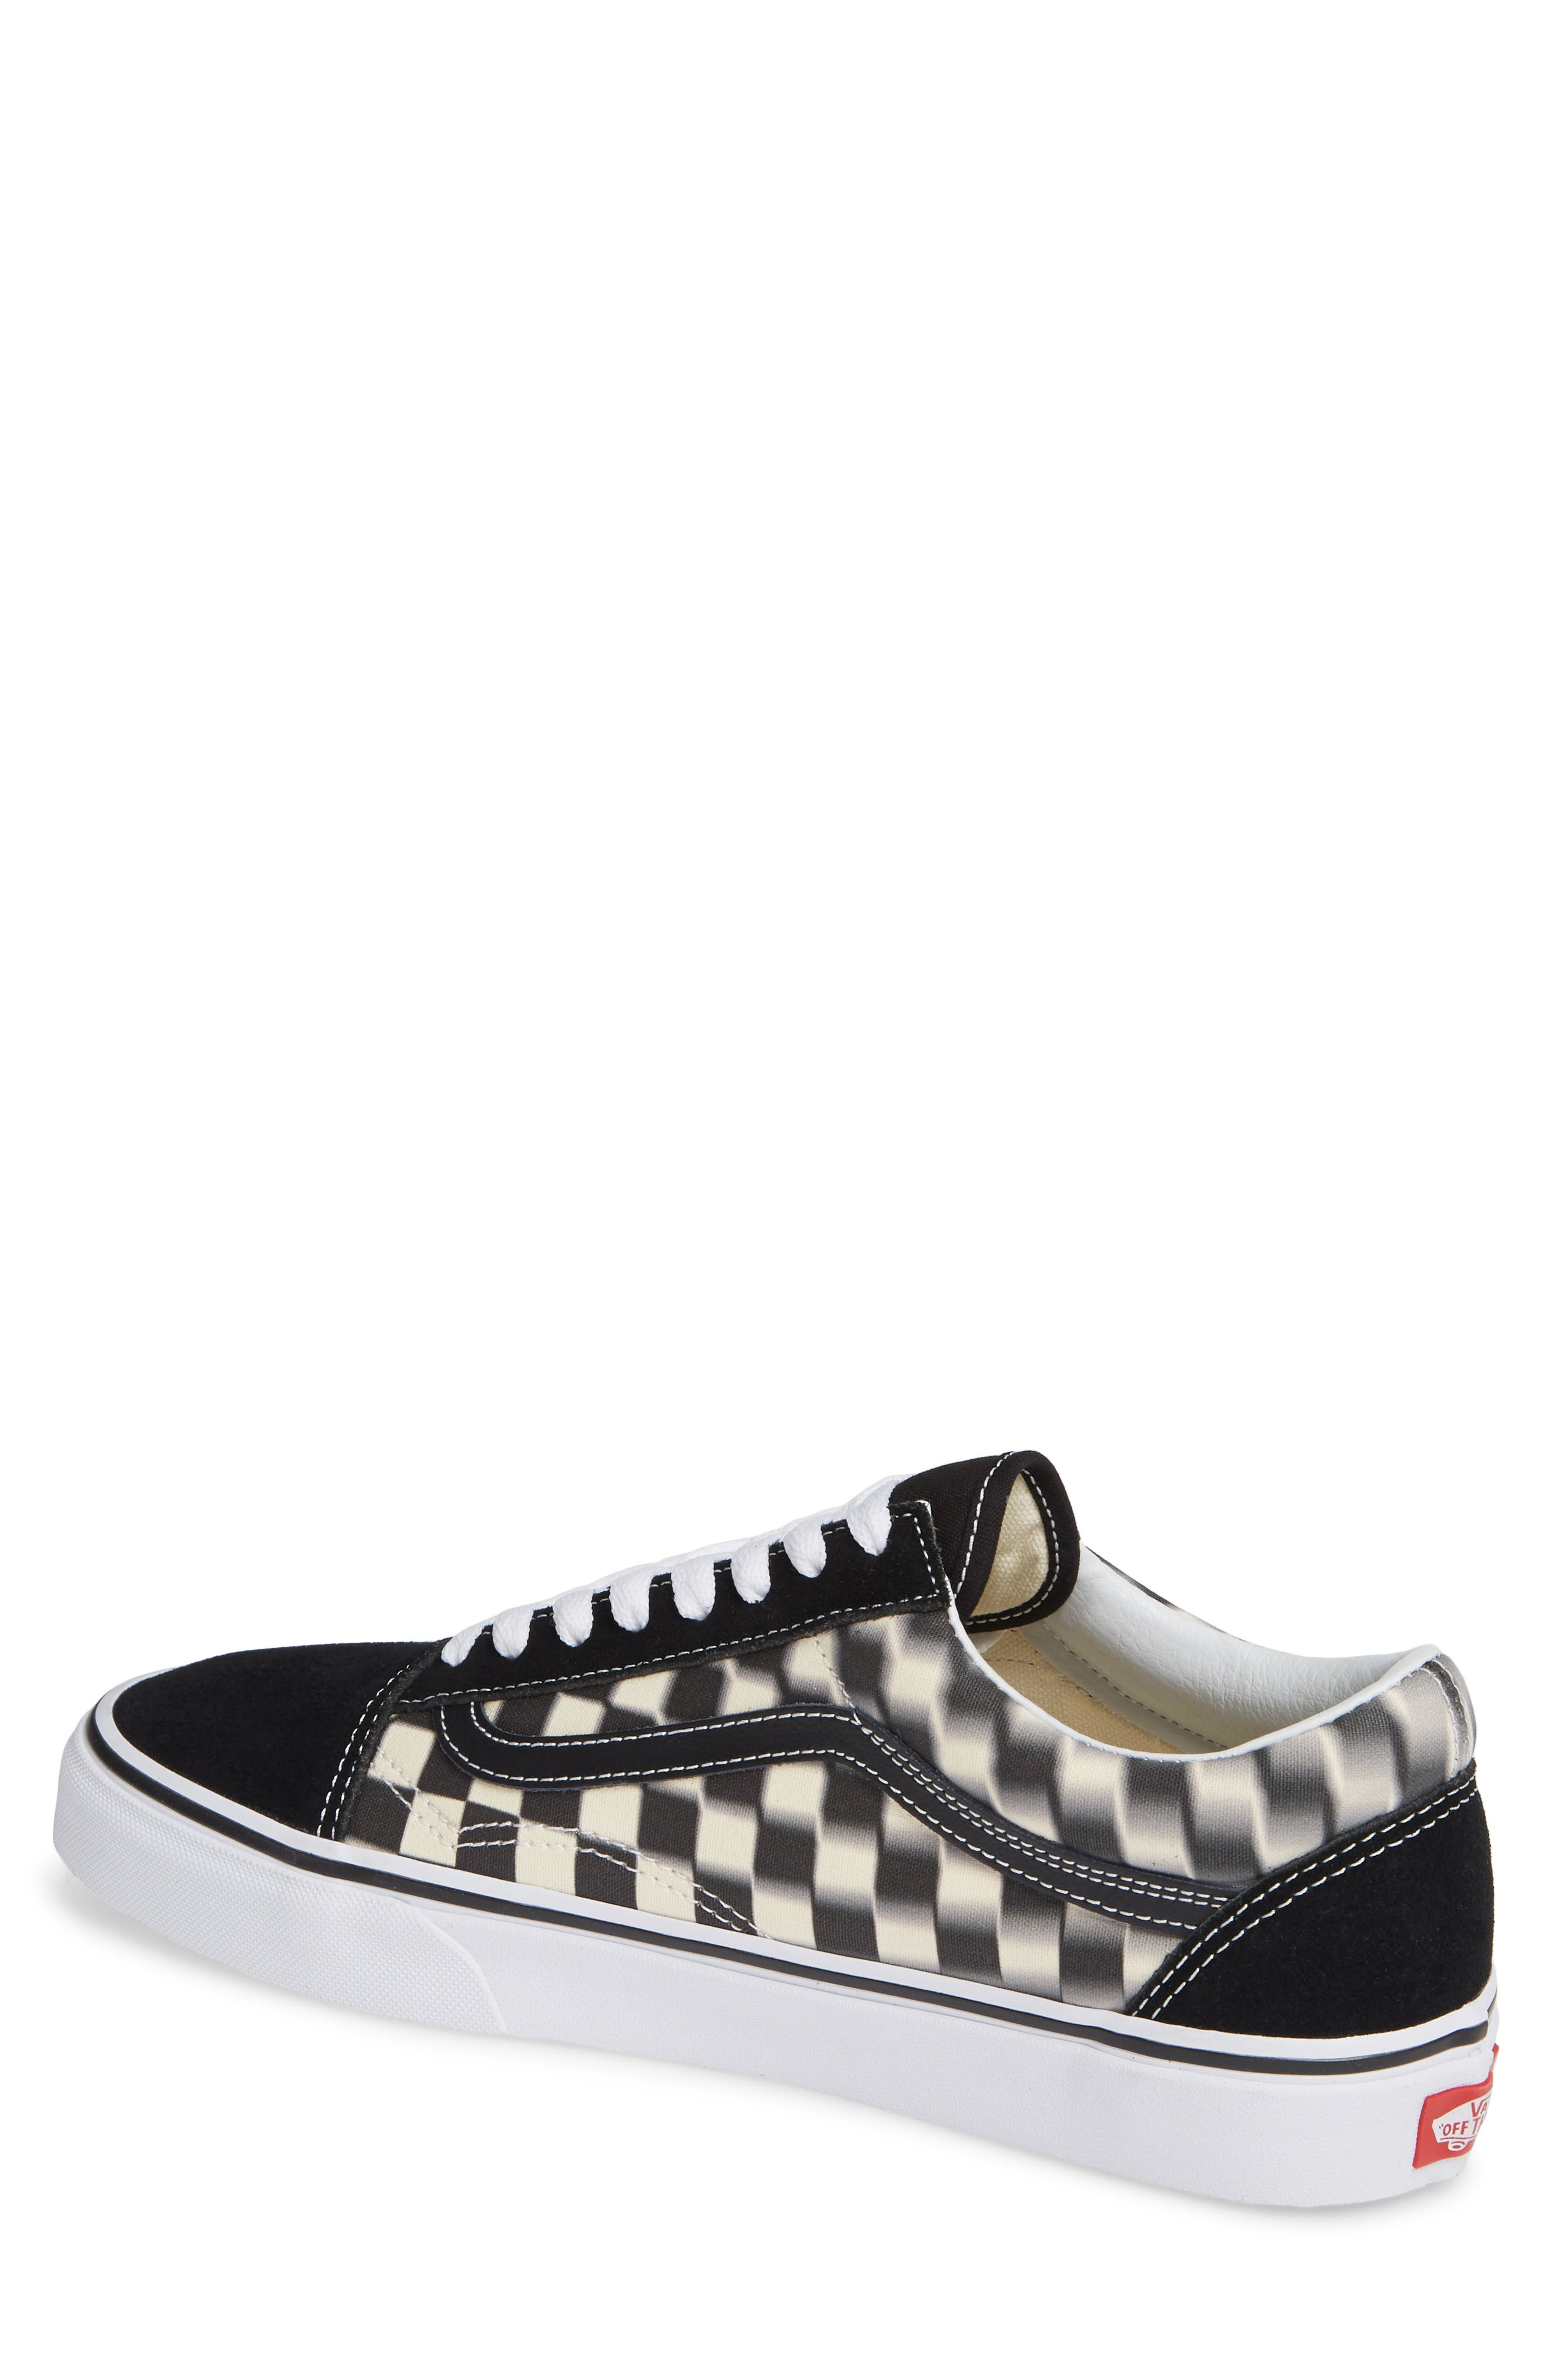 Old Skool Sneaker,                             Alternate thumbnail 2, color,                             005